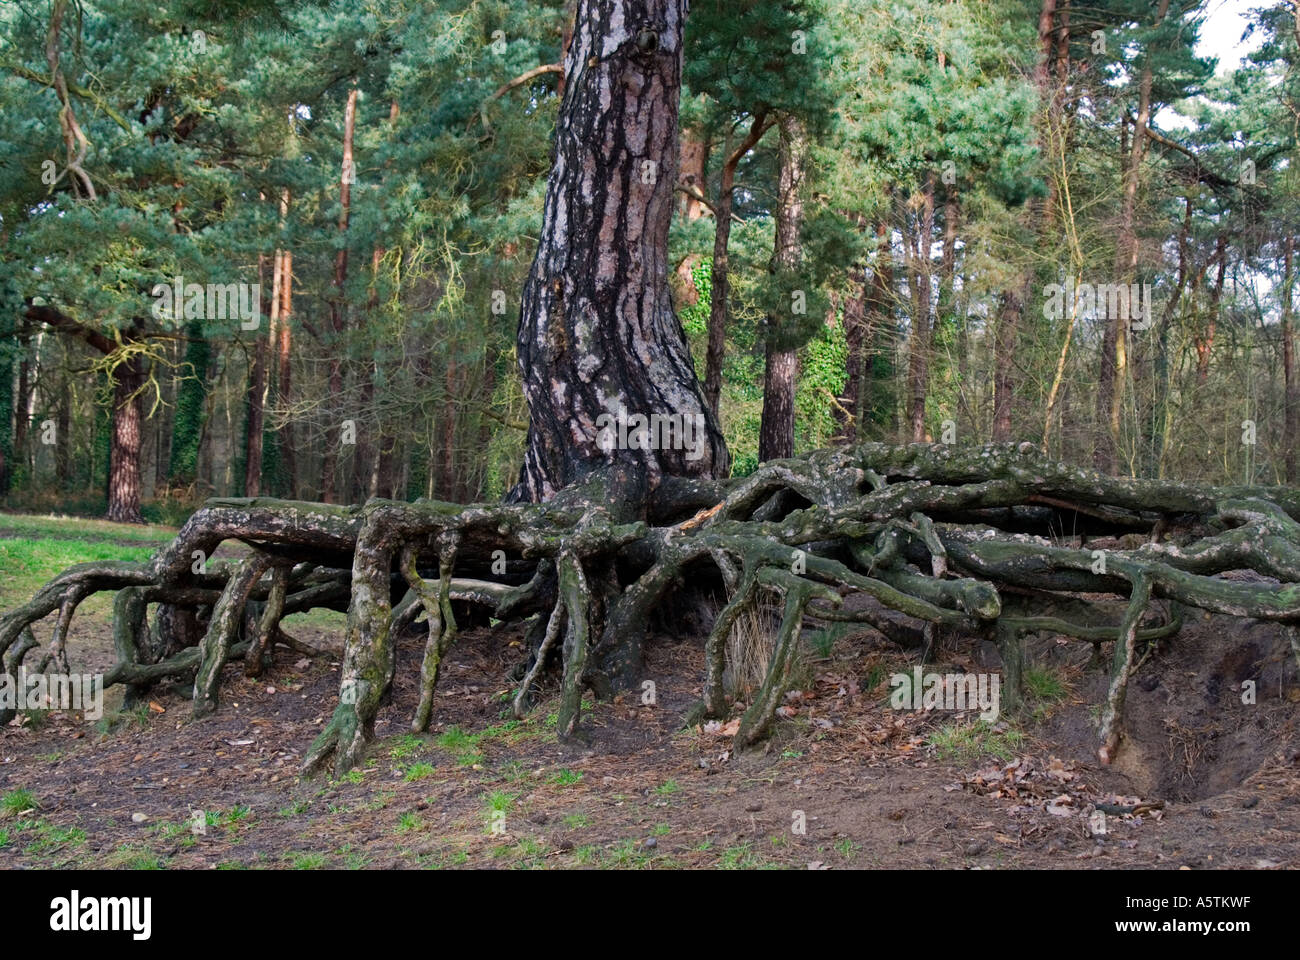 baum wurzeln kiefer pinus sylvestris stockfoto bild 6505182 alamy. Black Bedroom Furniture Sets. Home Design Ideas